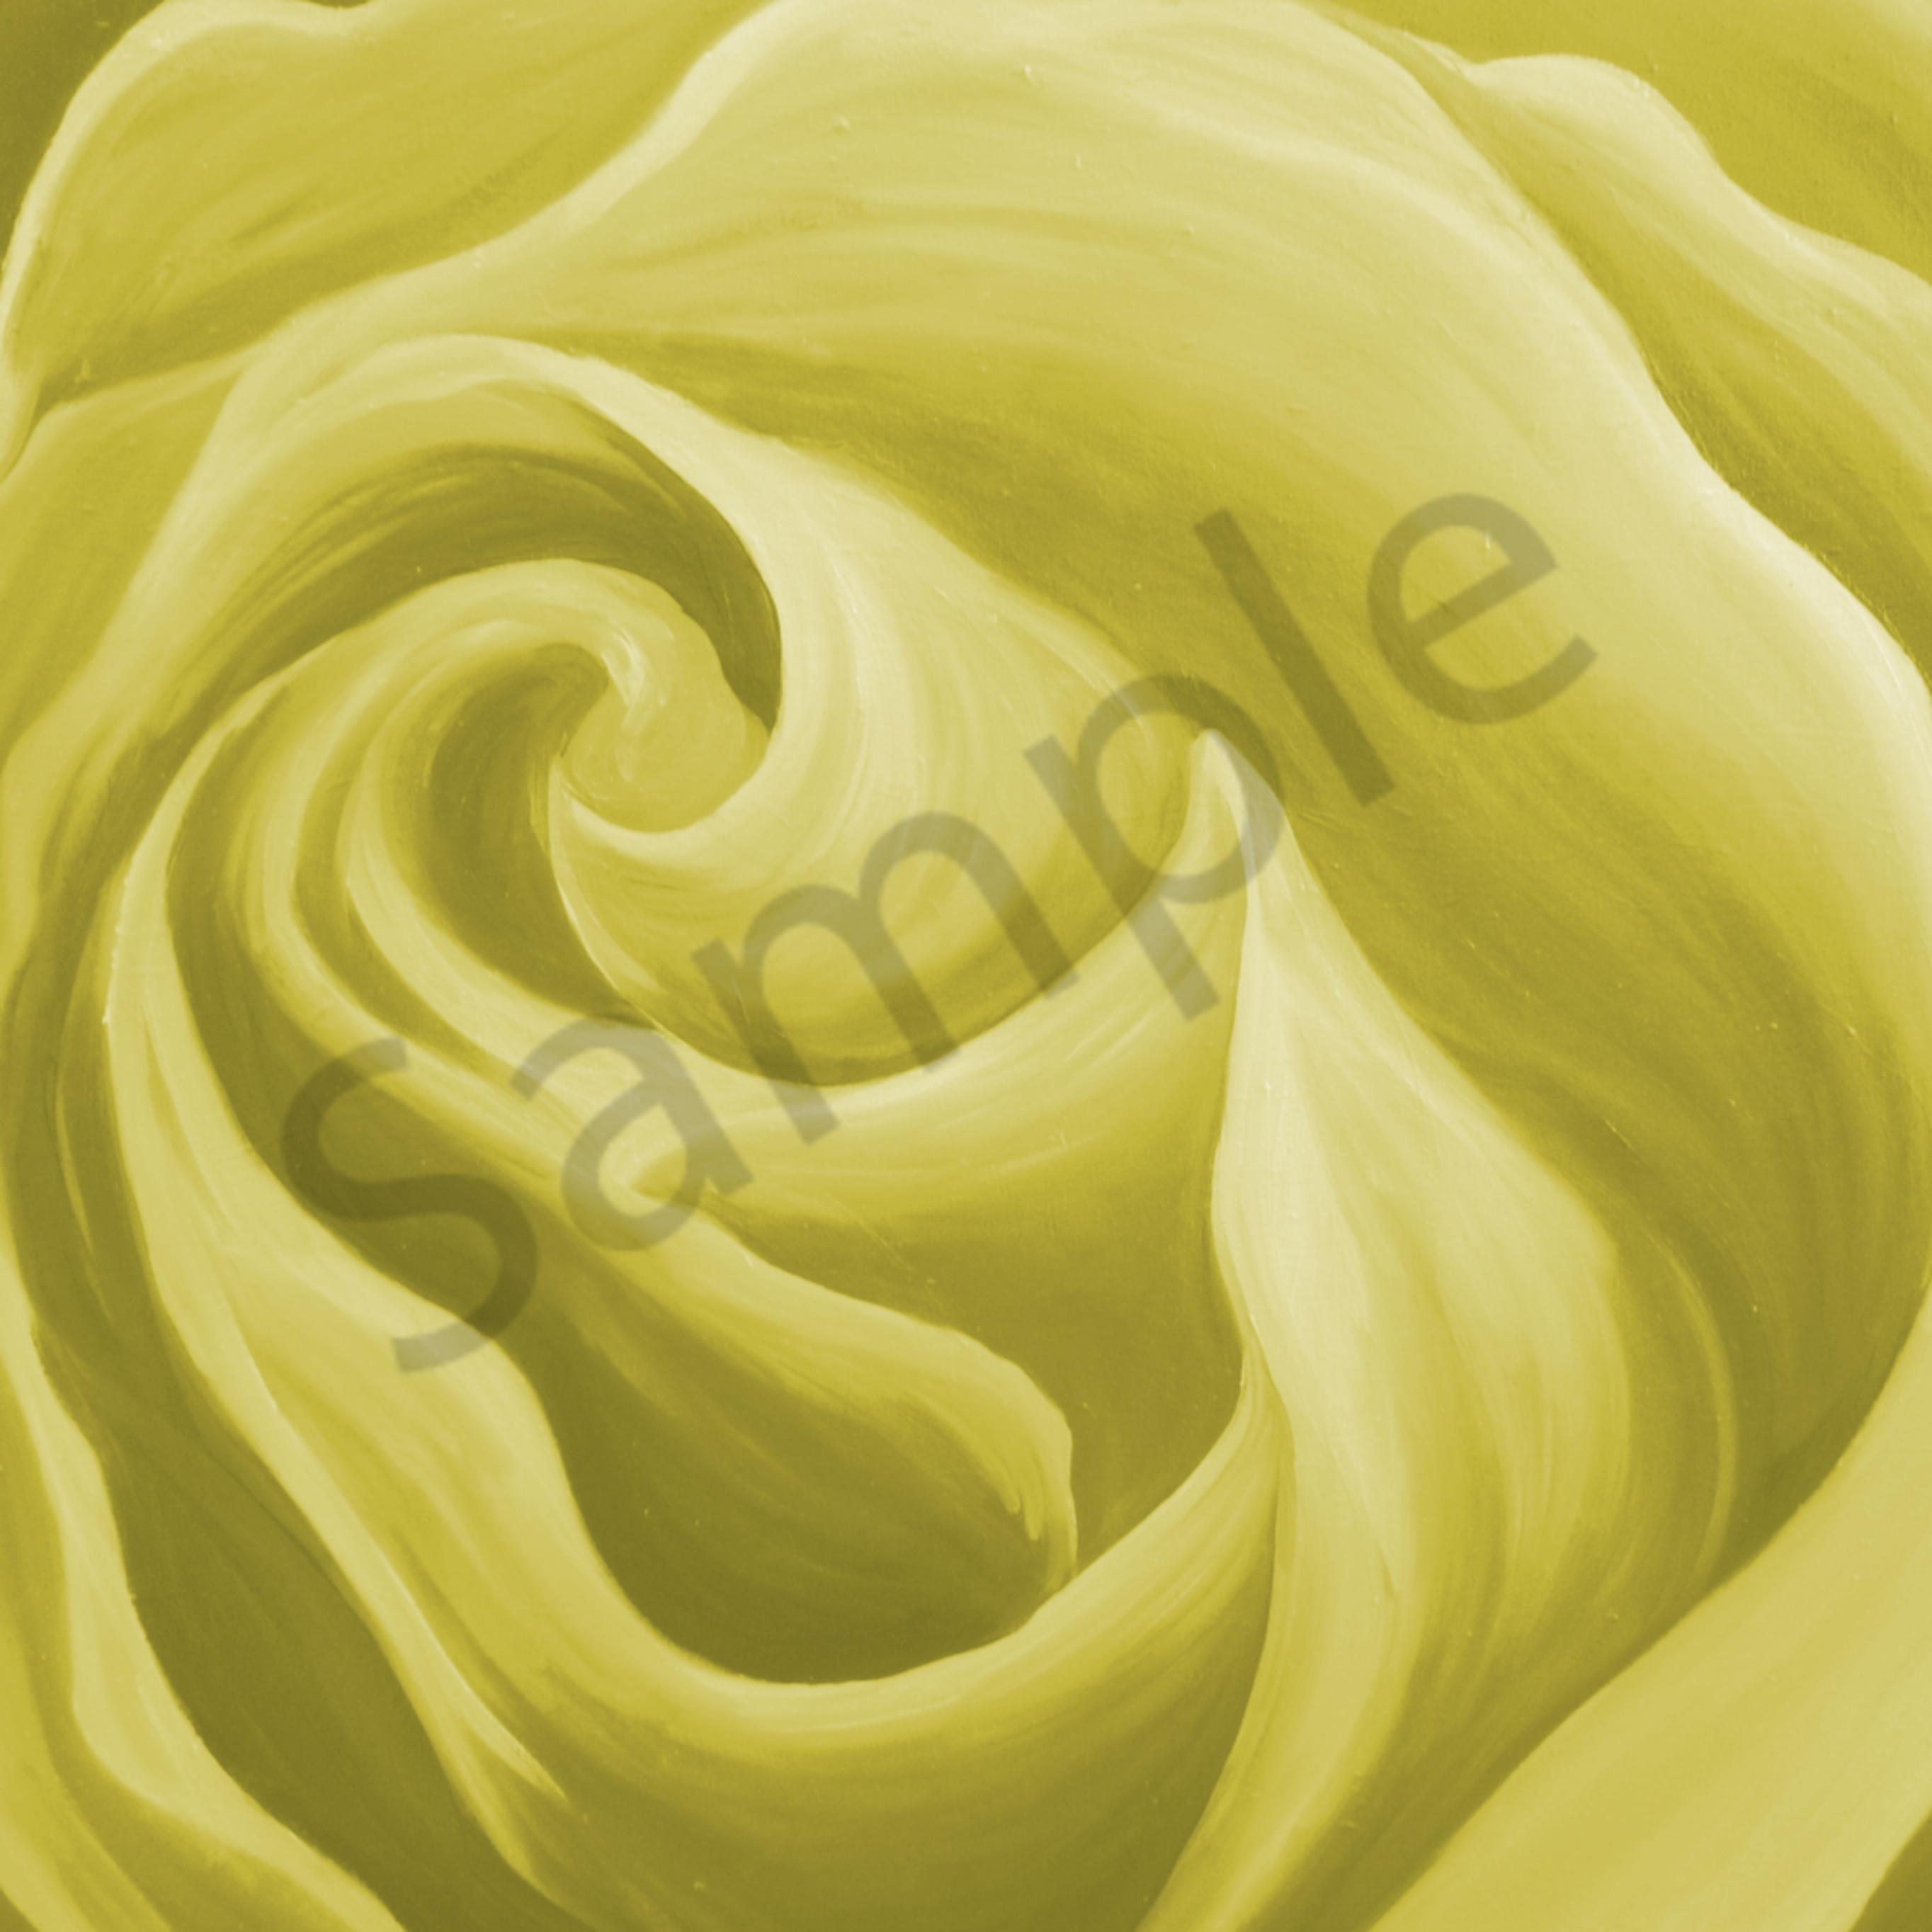 Light yellow rose k8jvou